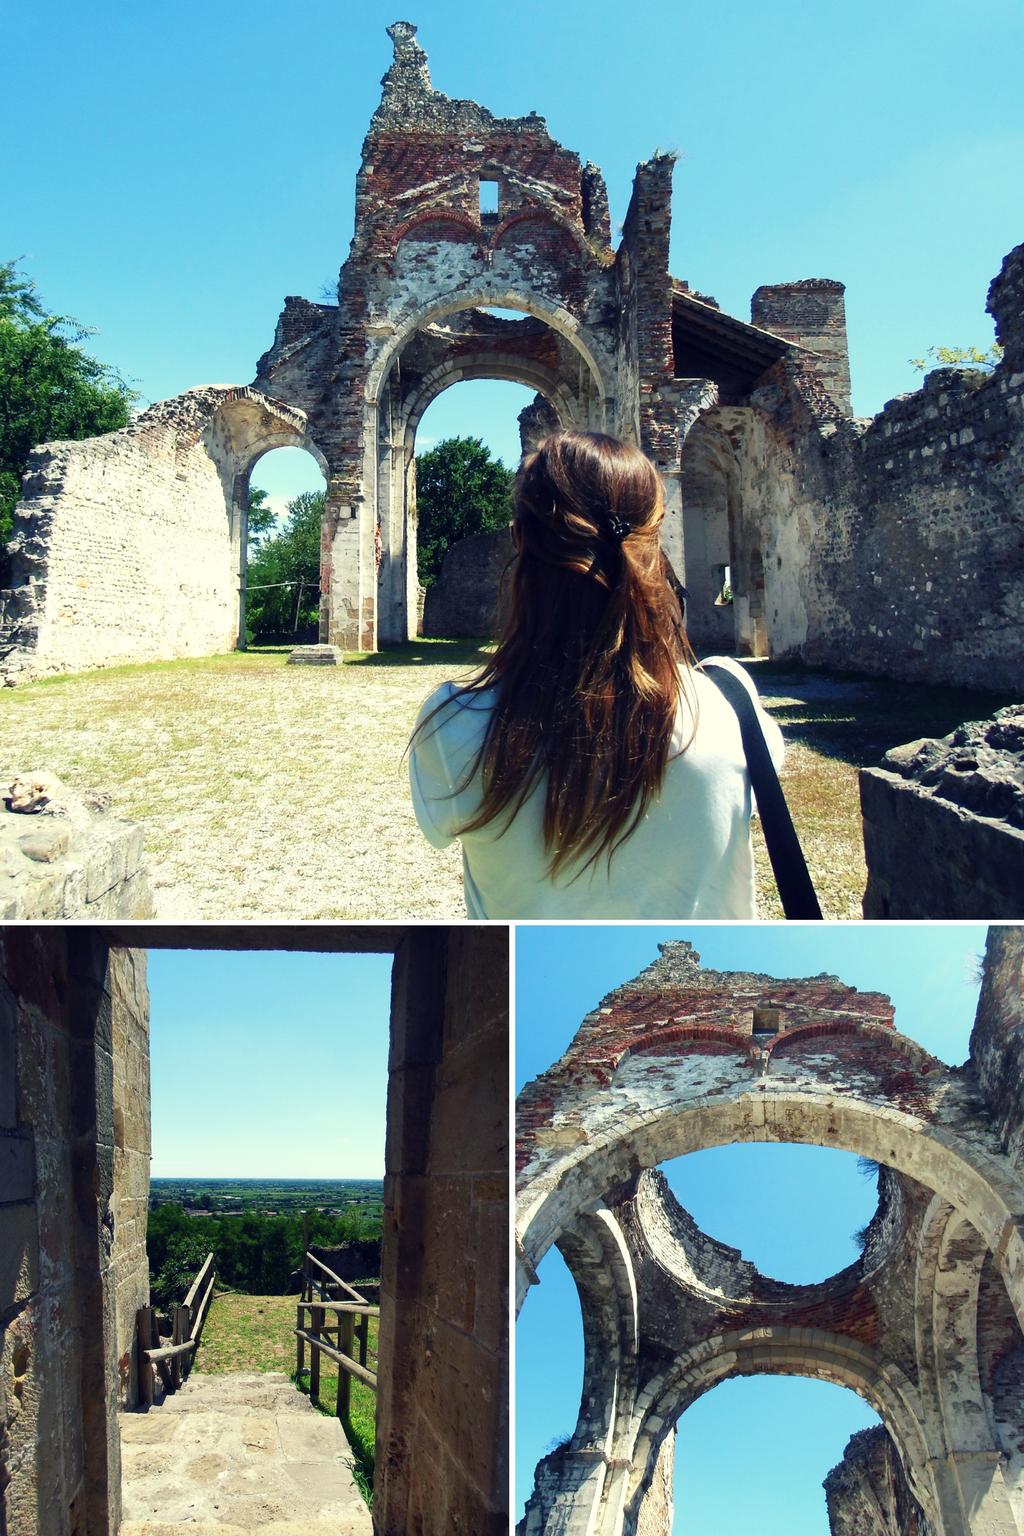 abbazia-santeustachio-nervesa-della-battaglia